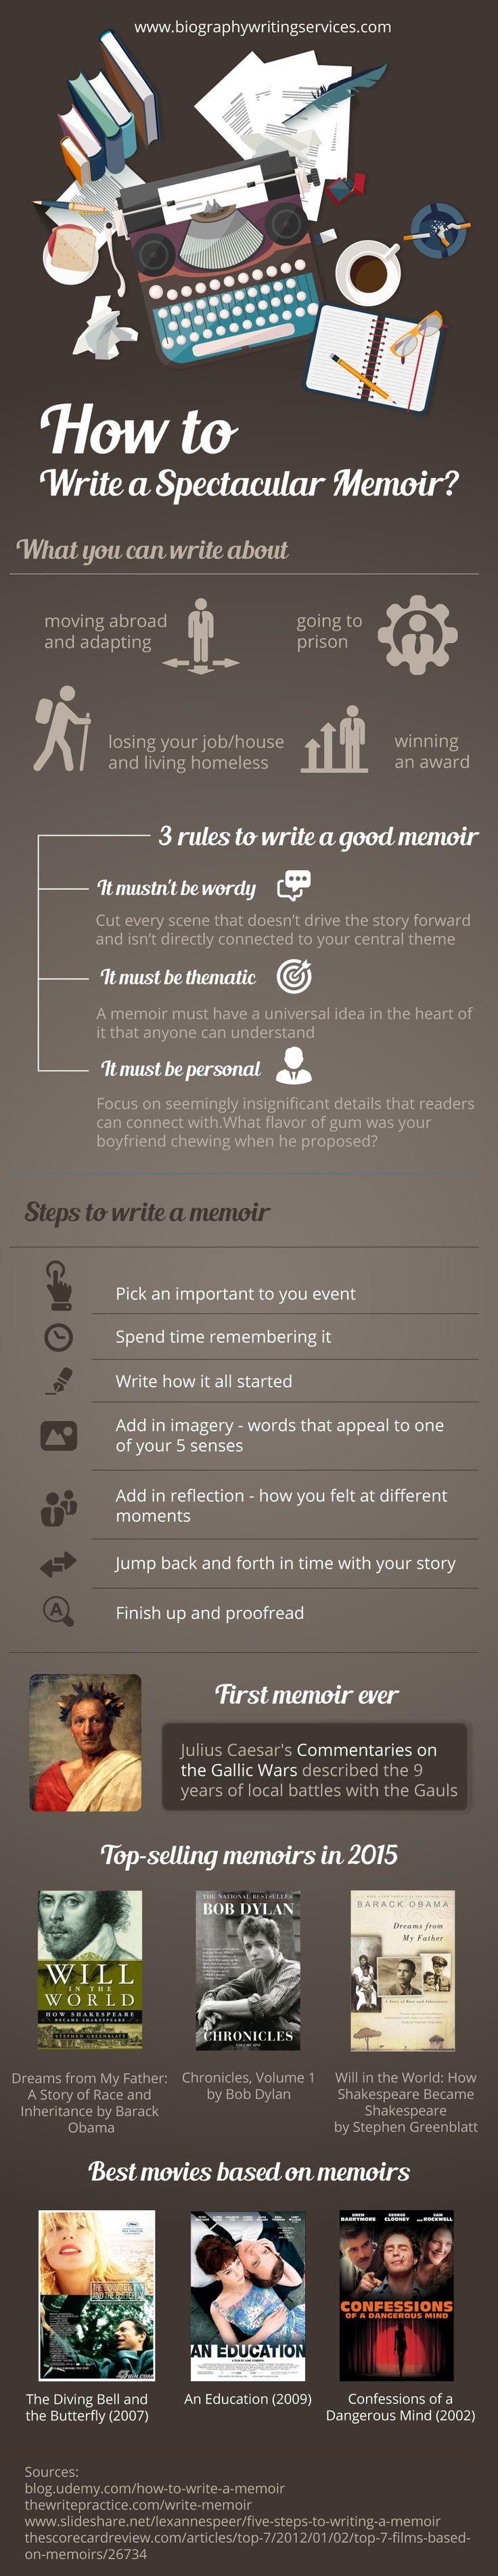 how to write a spectacular memoir inforgaphic …